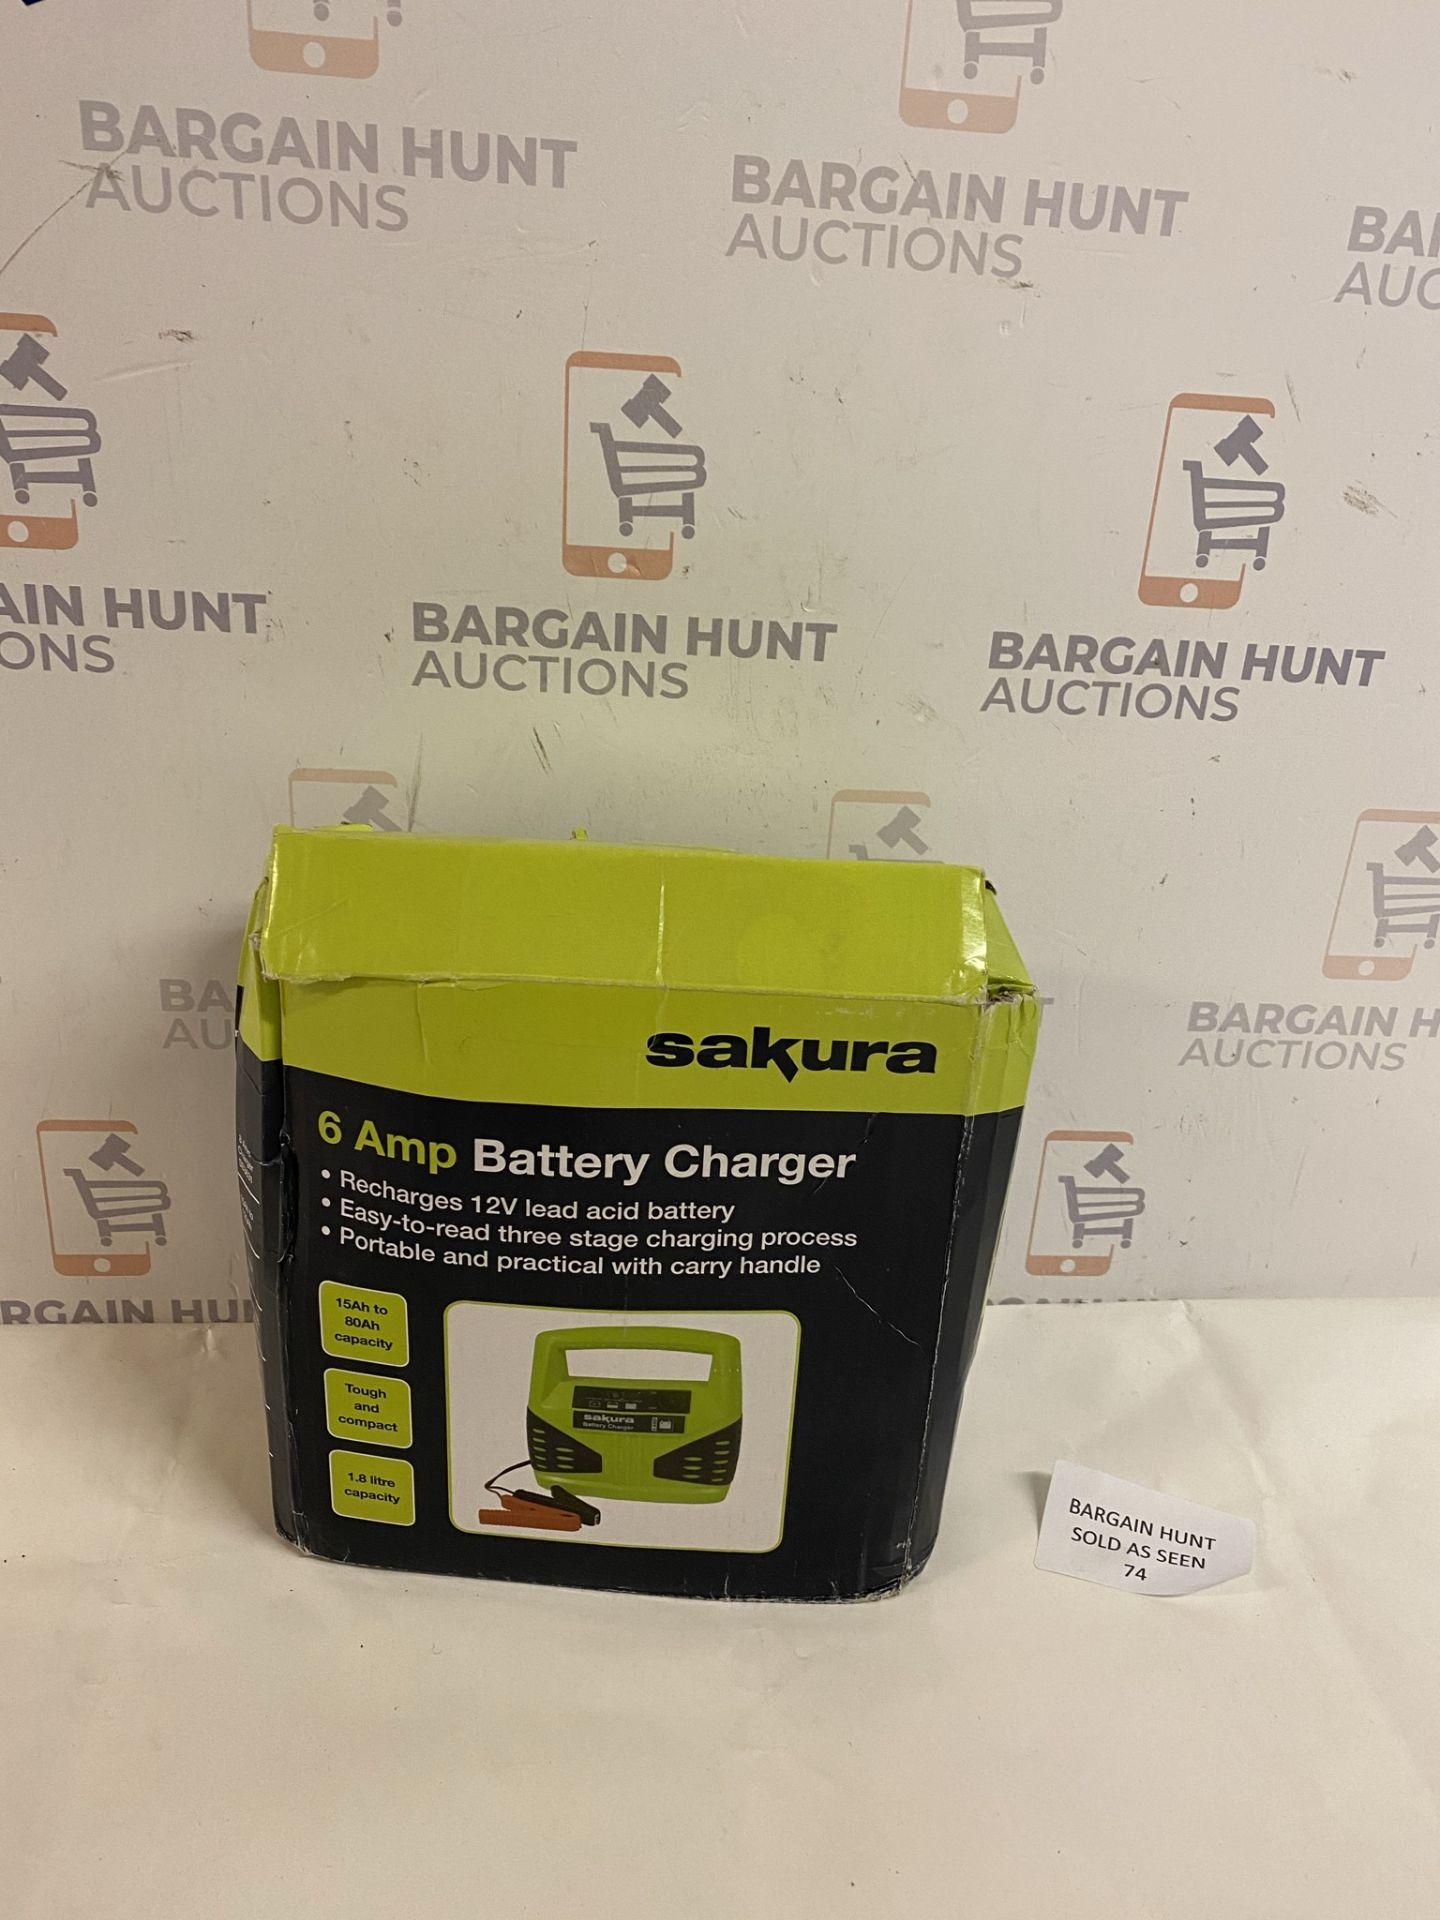 Sakura 6 Amp Battery Charger